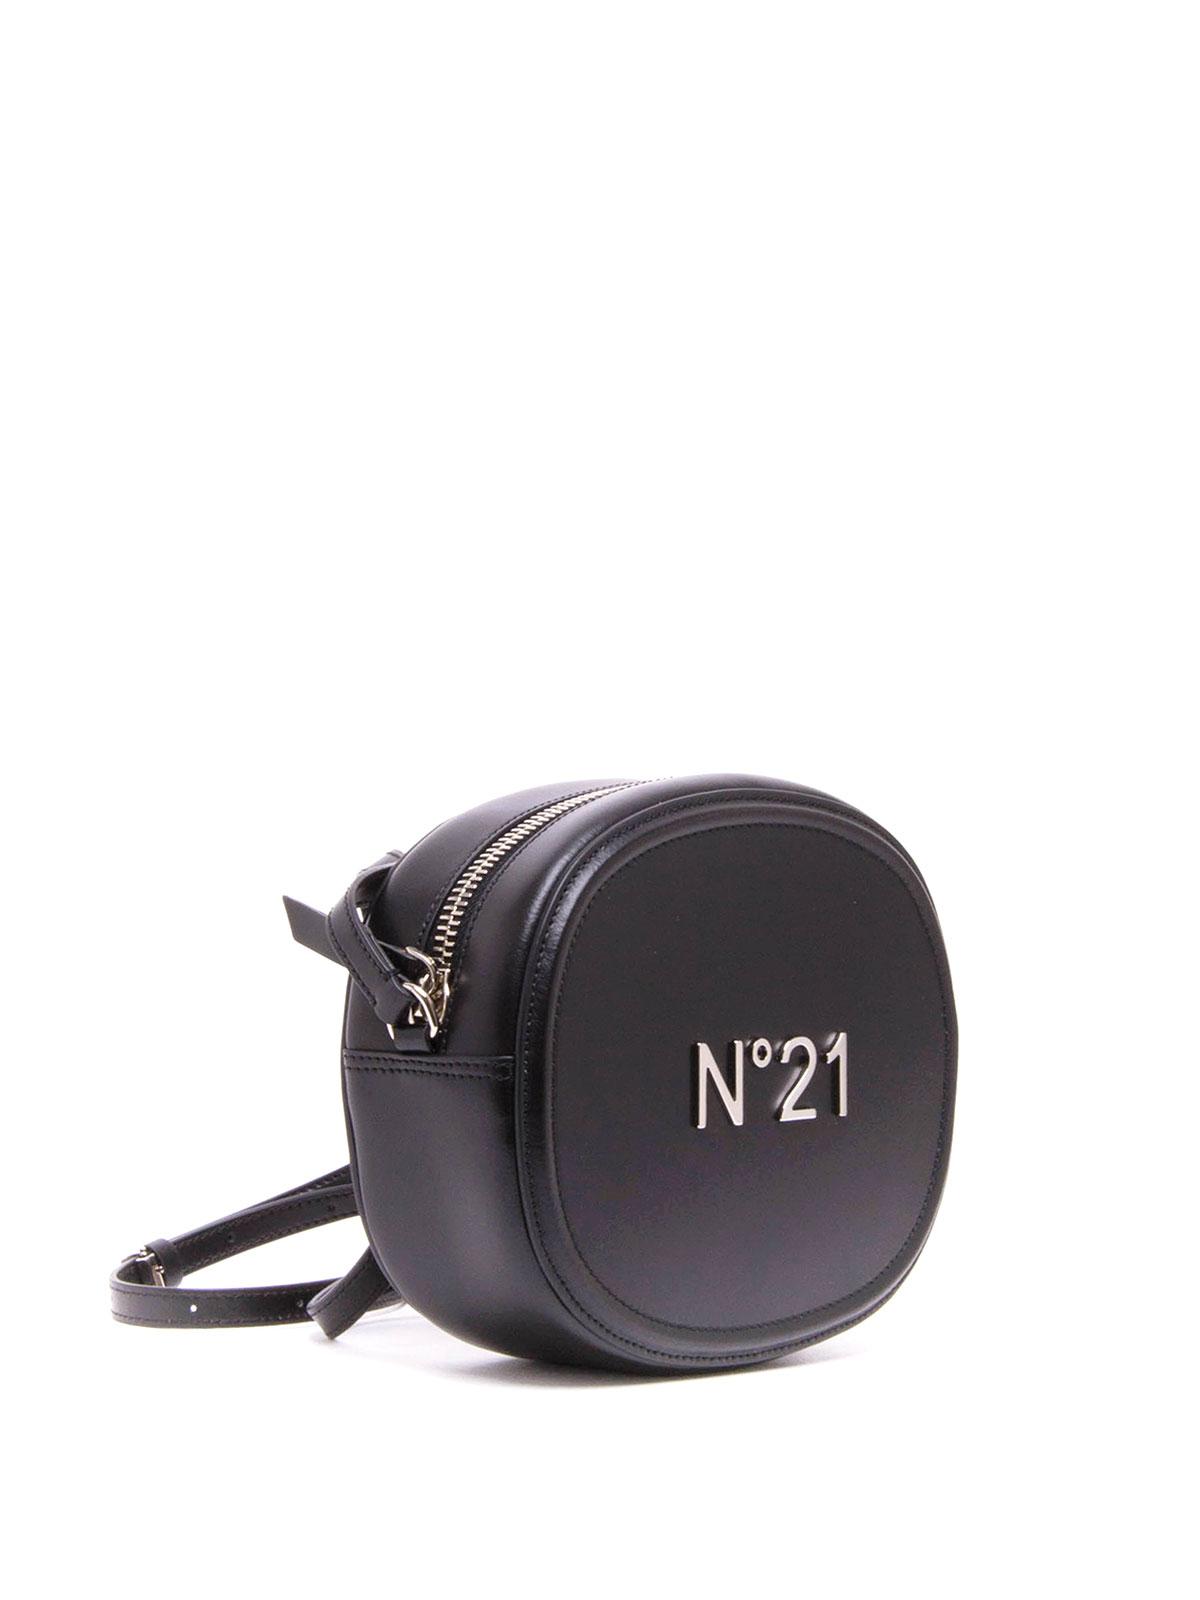 0648fd5b26 N°21: borse a tracolla online - Borsa in pelle con logo in metallo